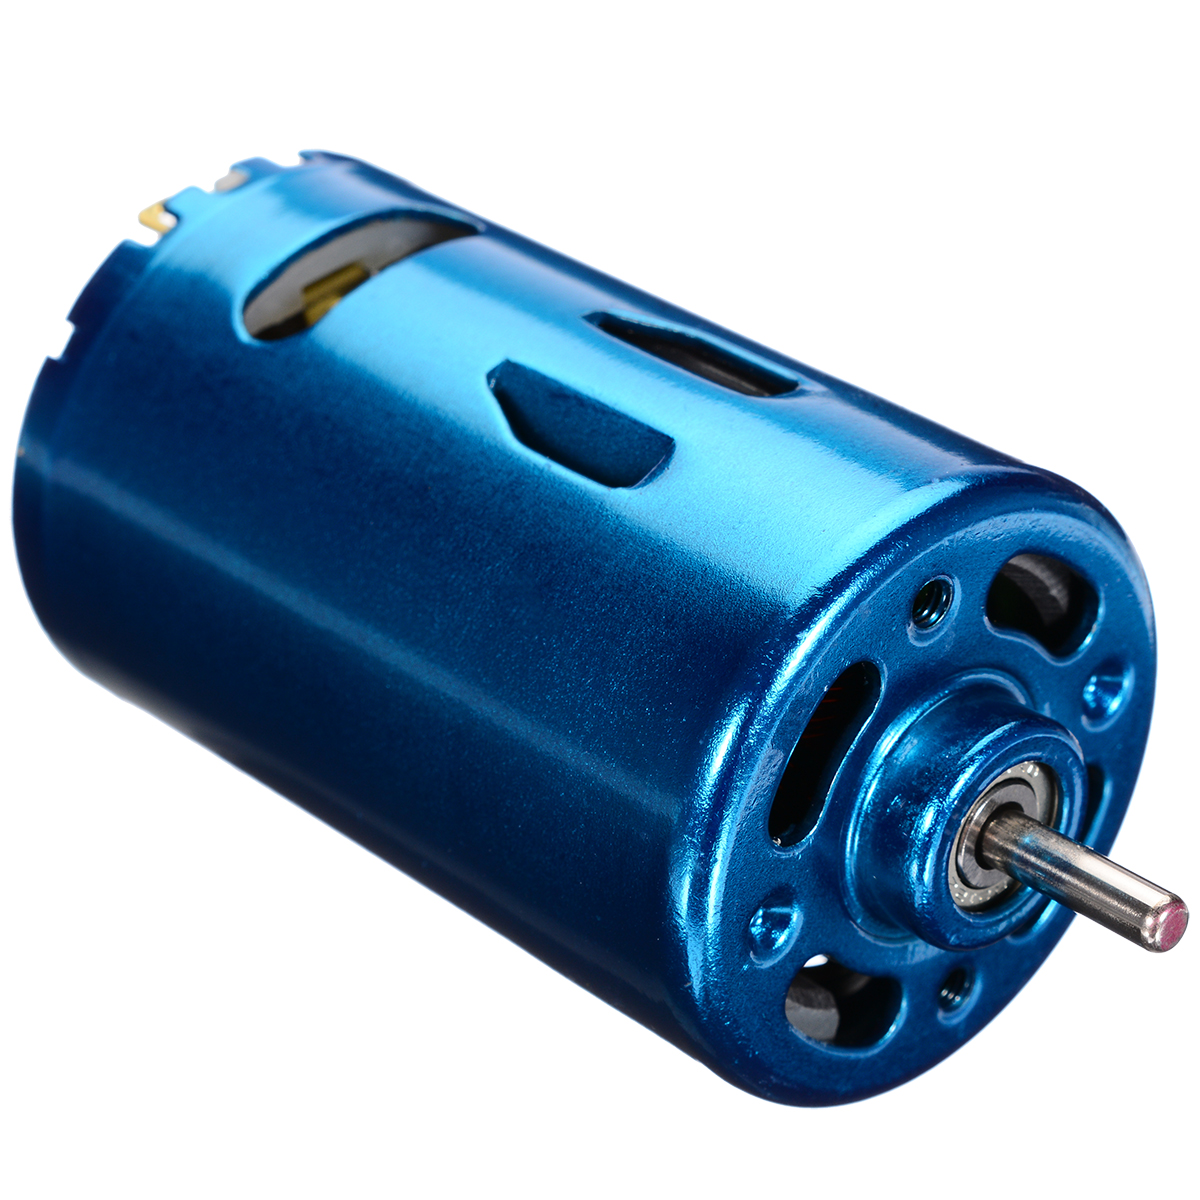 1Pcs High Speed Blue RS-550 DC MotorLarge Torque RC Car Boat Model 12V 24V 30000RPM DC Motor High Quality